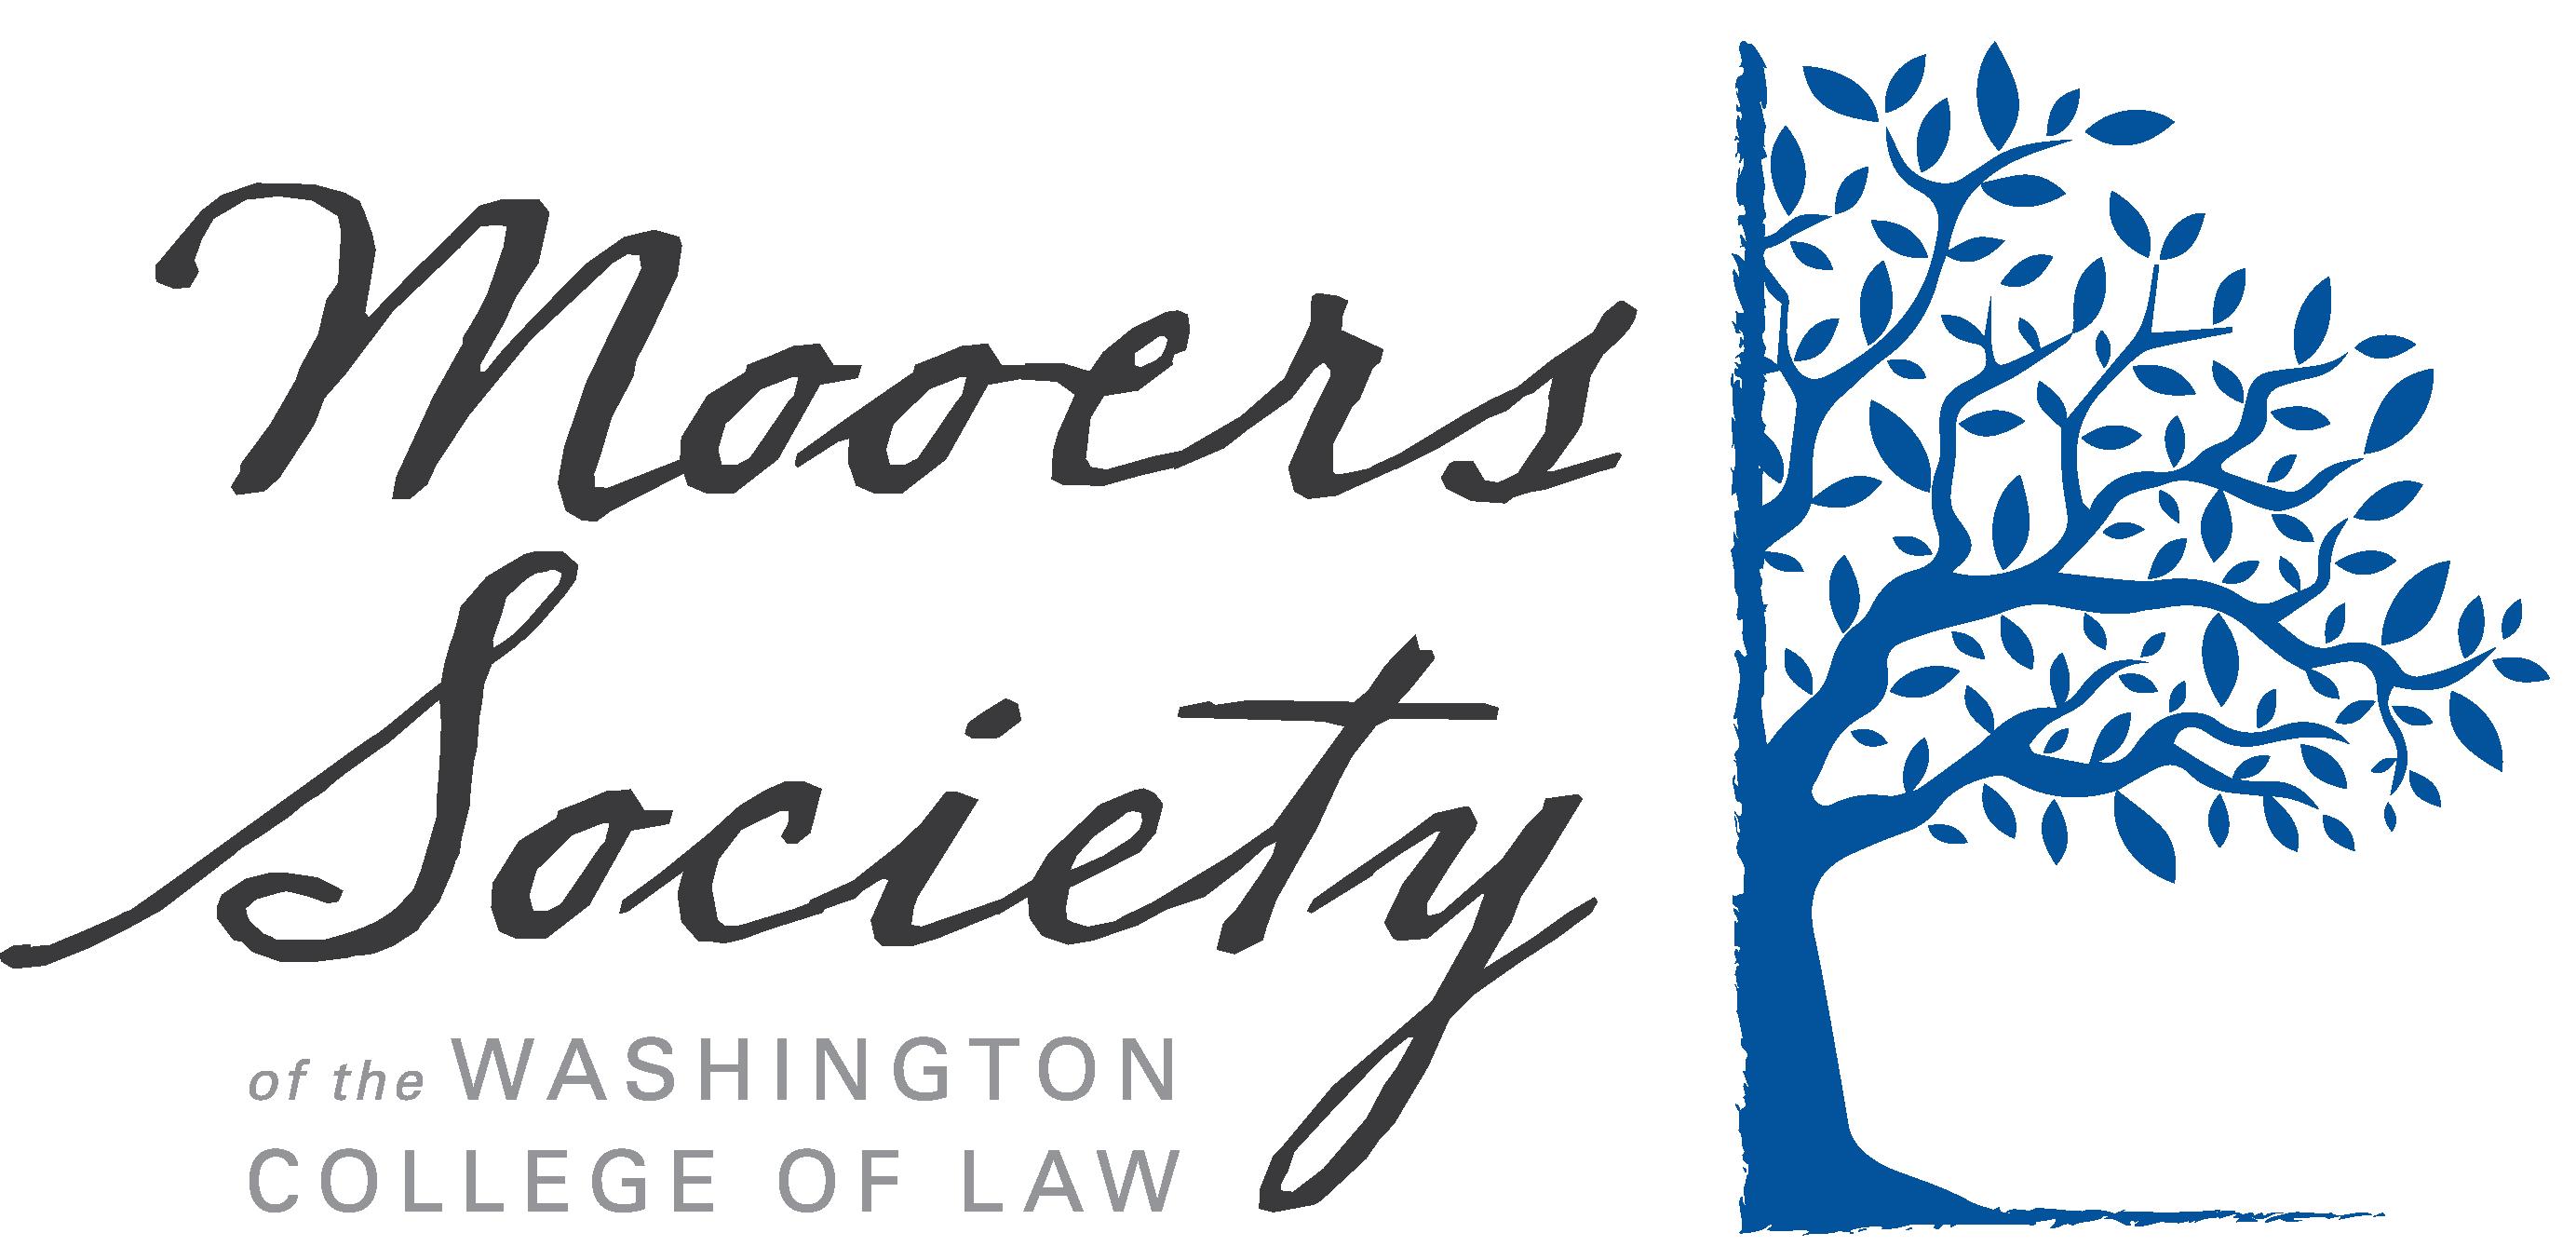 WCL_MooersSociety_Logo_C_ol